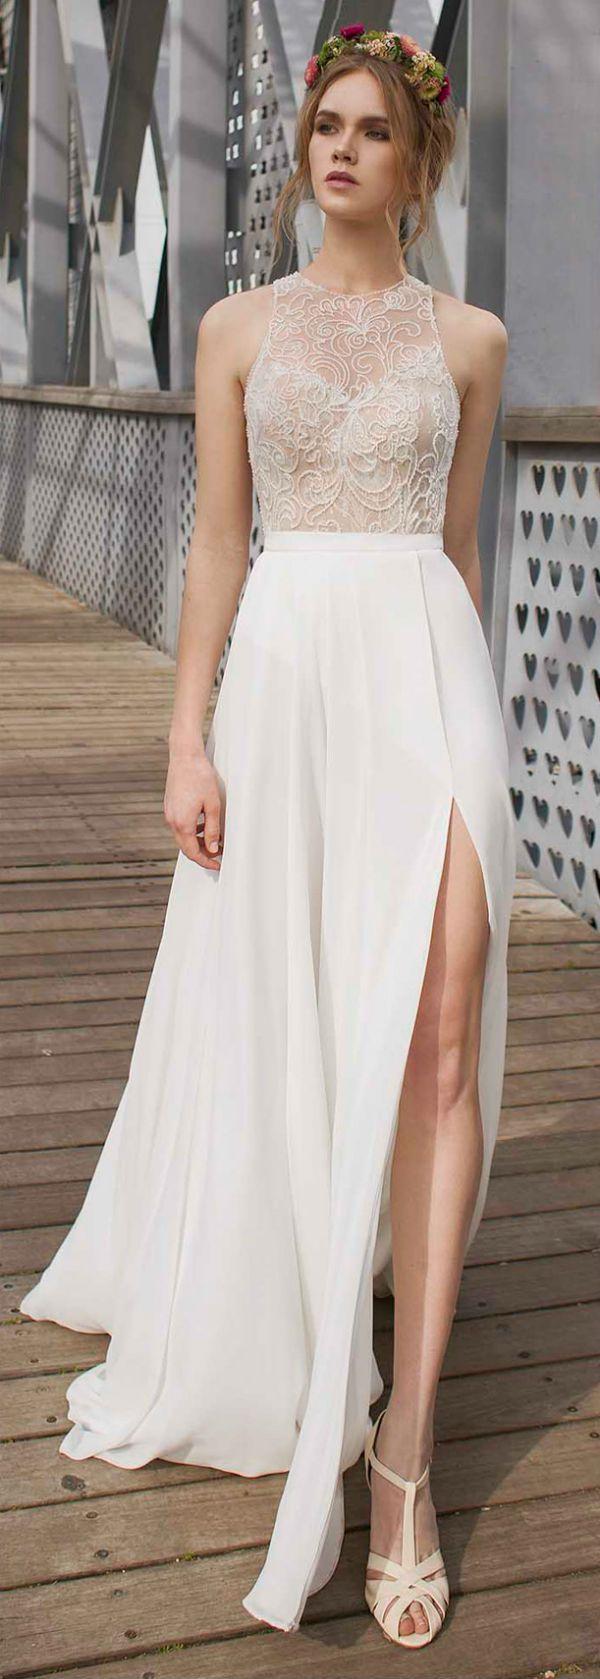 Bridal dress hochzeitskleid vestido de novia vestido de noiva